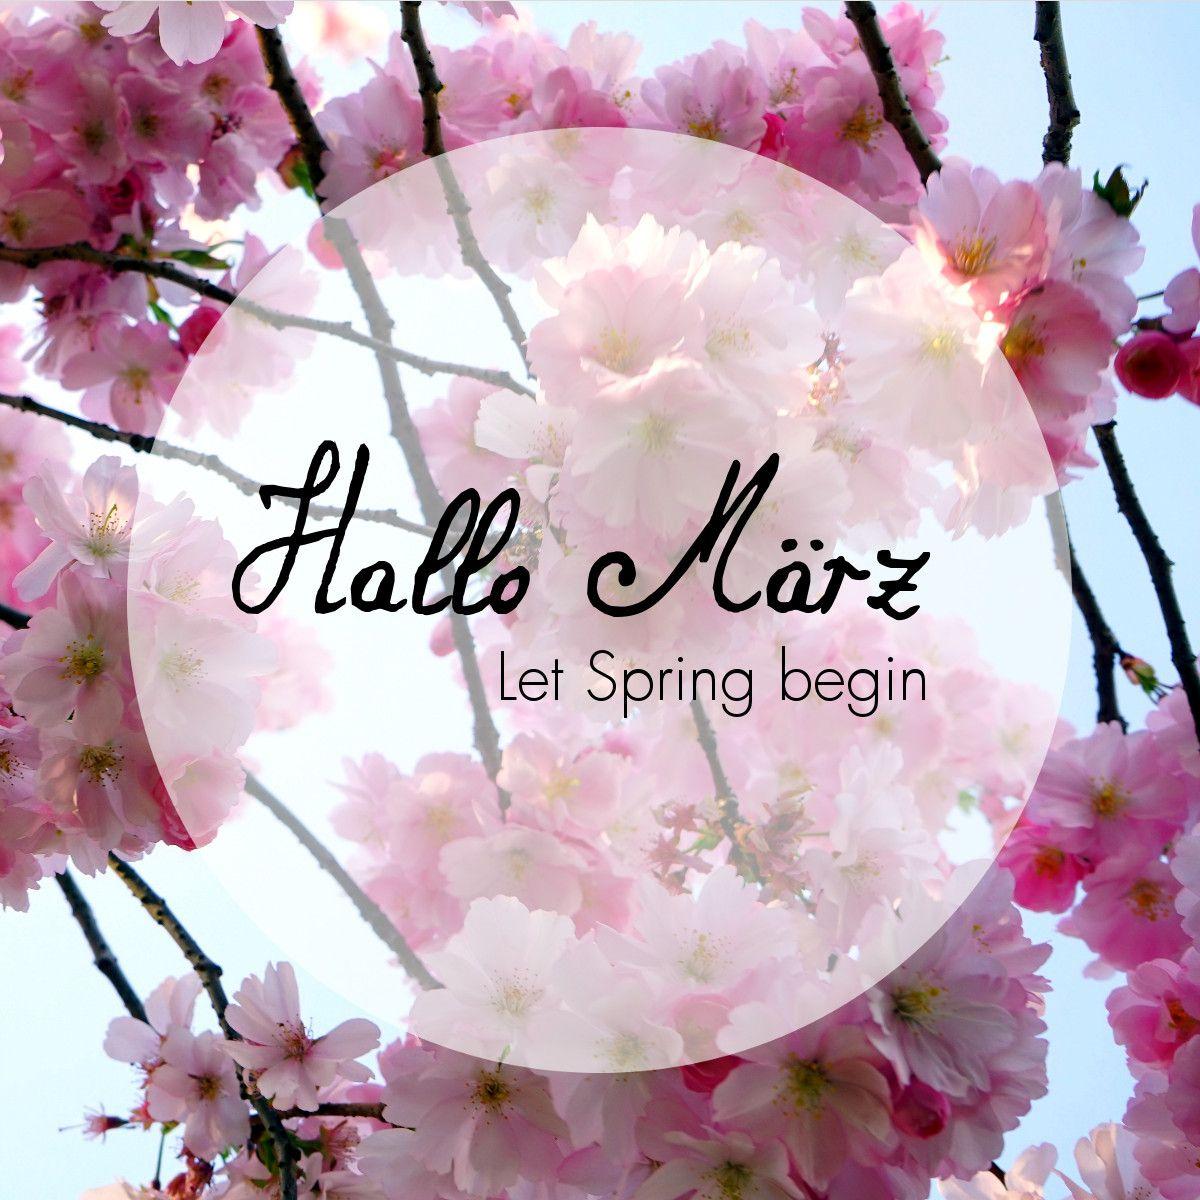 Hallo #märz - Let #spring Begin! #justaway #travel #quotes über Lustige Frühlingsbilder Kostenlos